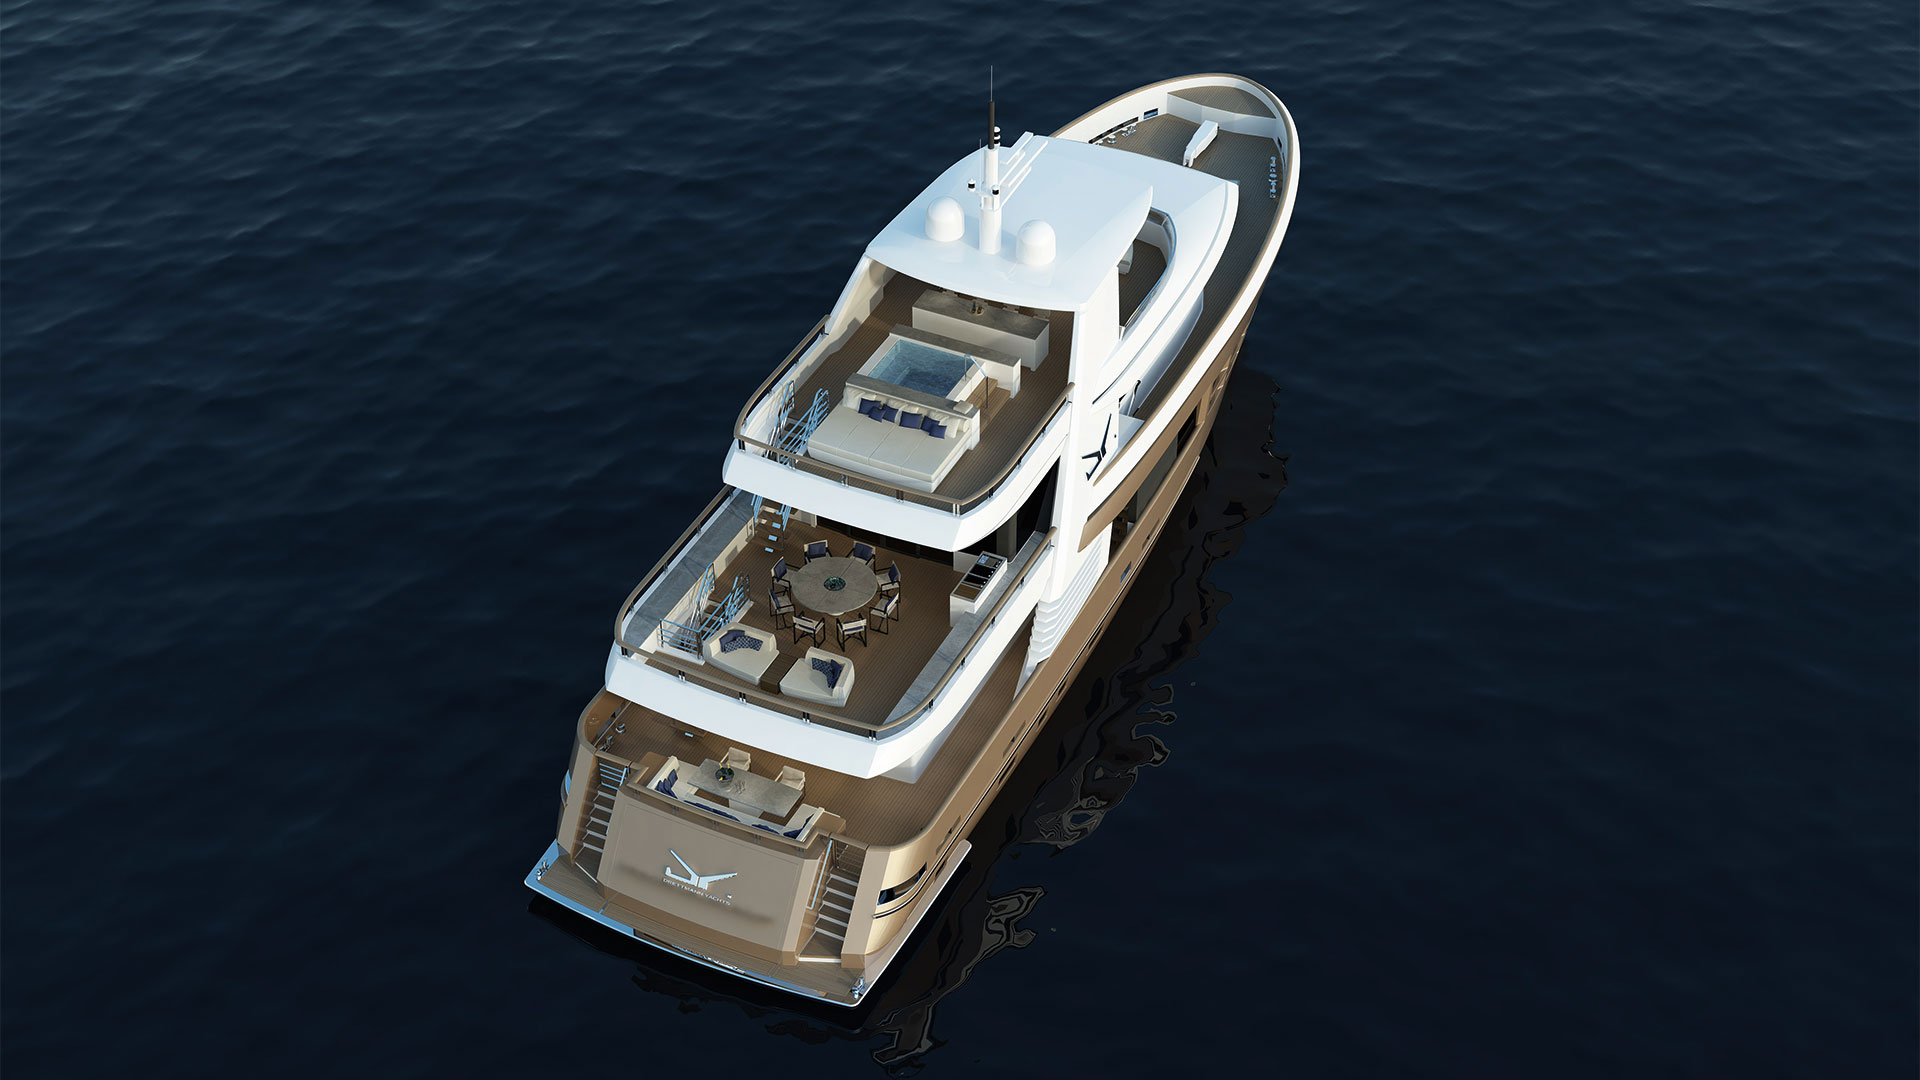 Bandido 110 - Bandido Yachts by Drettmann - Drettmann Yachts